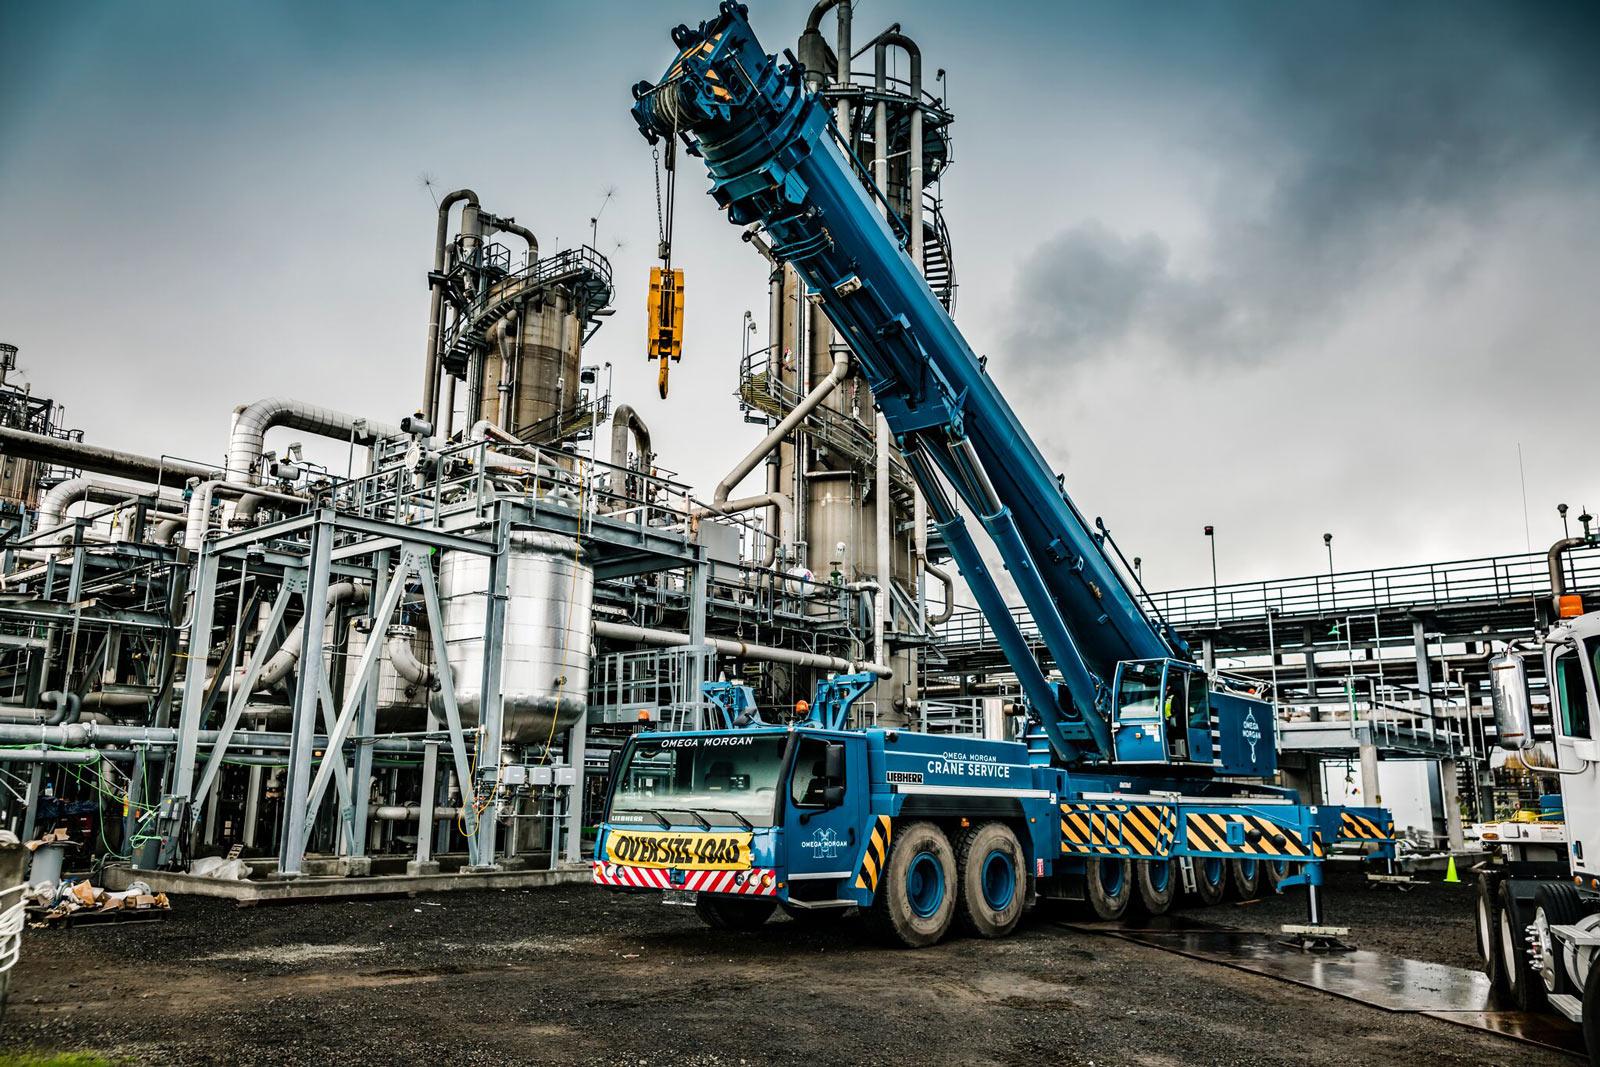 blue omega morgan crane at chemical plant in Longview, Washington